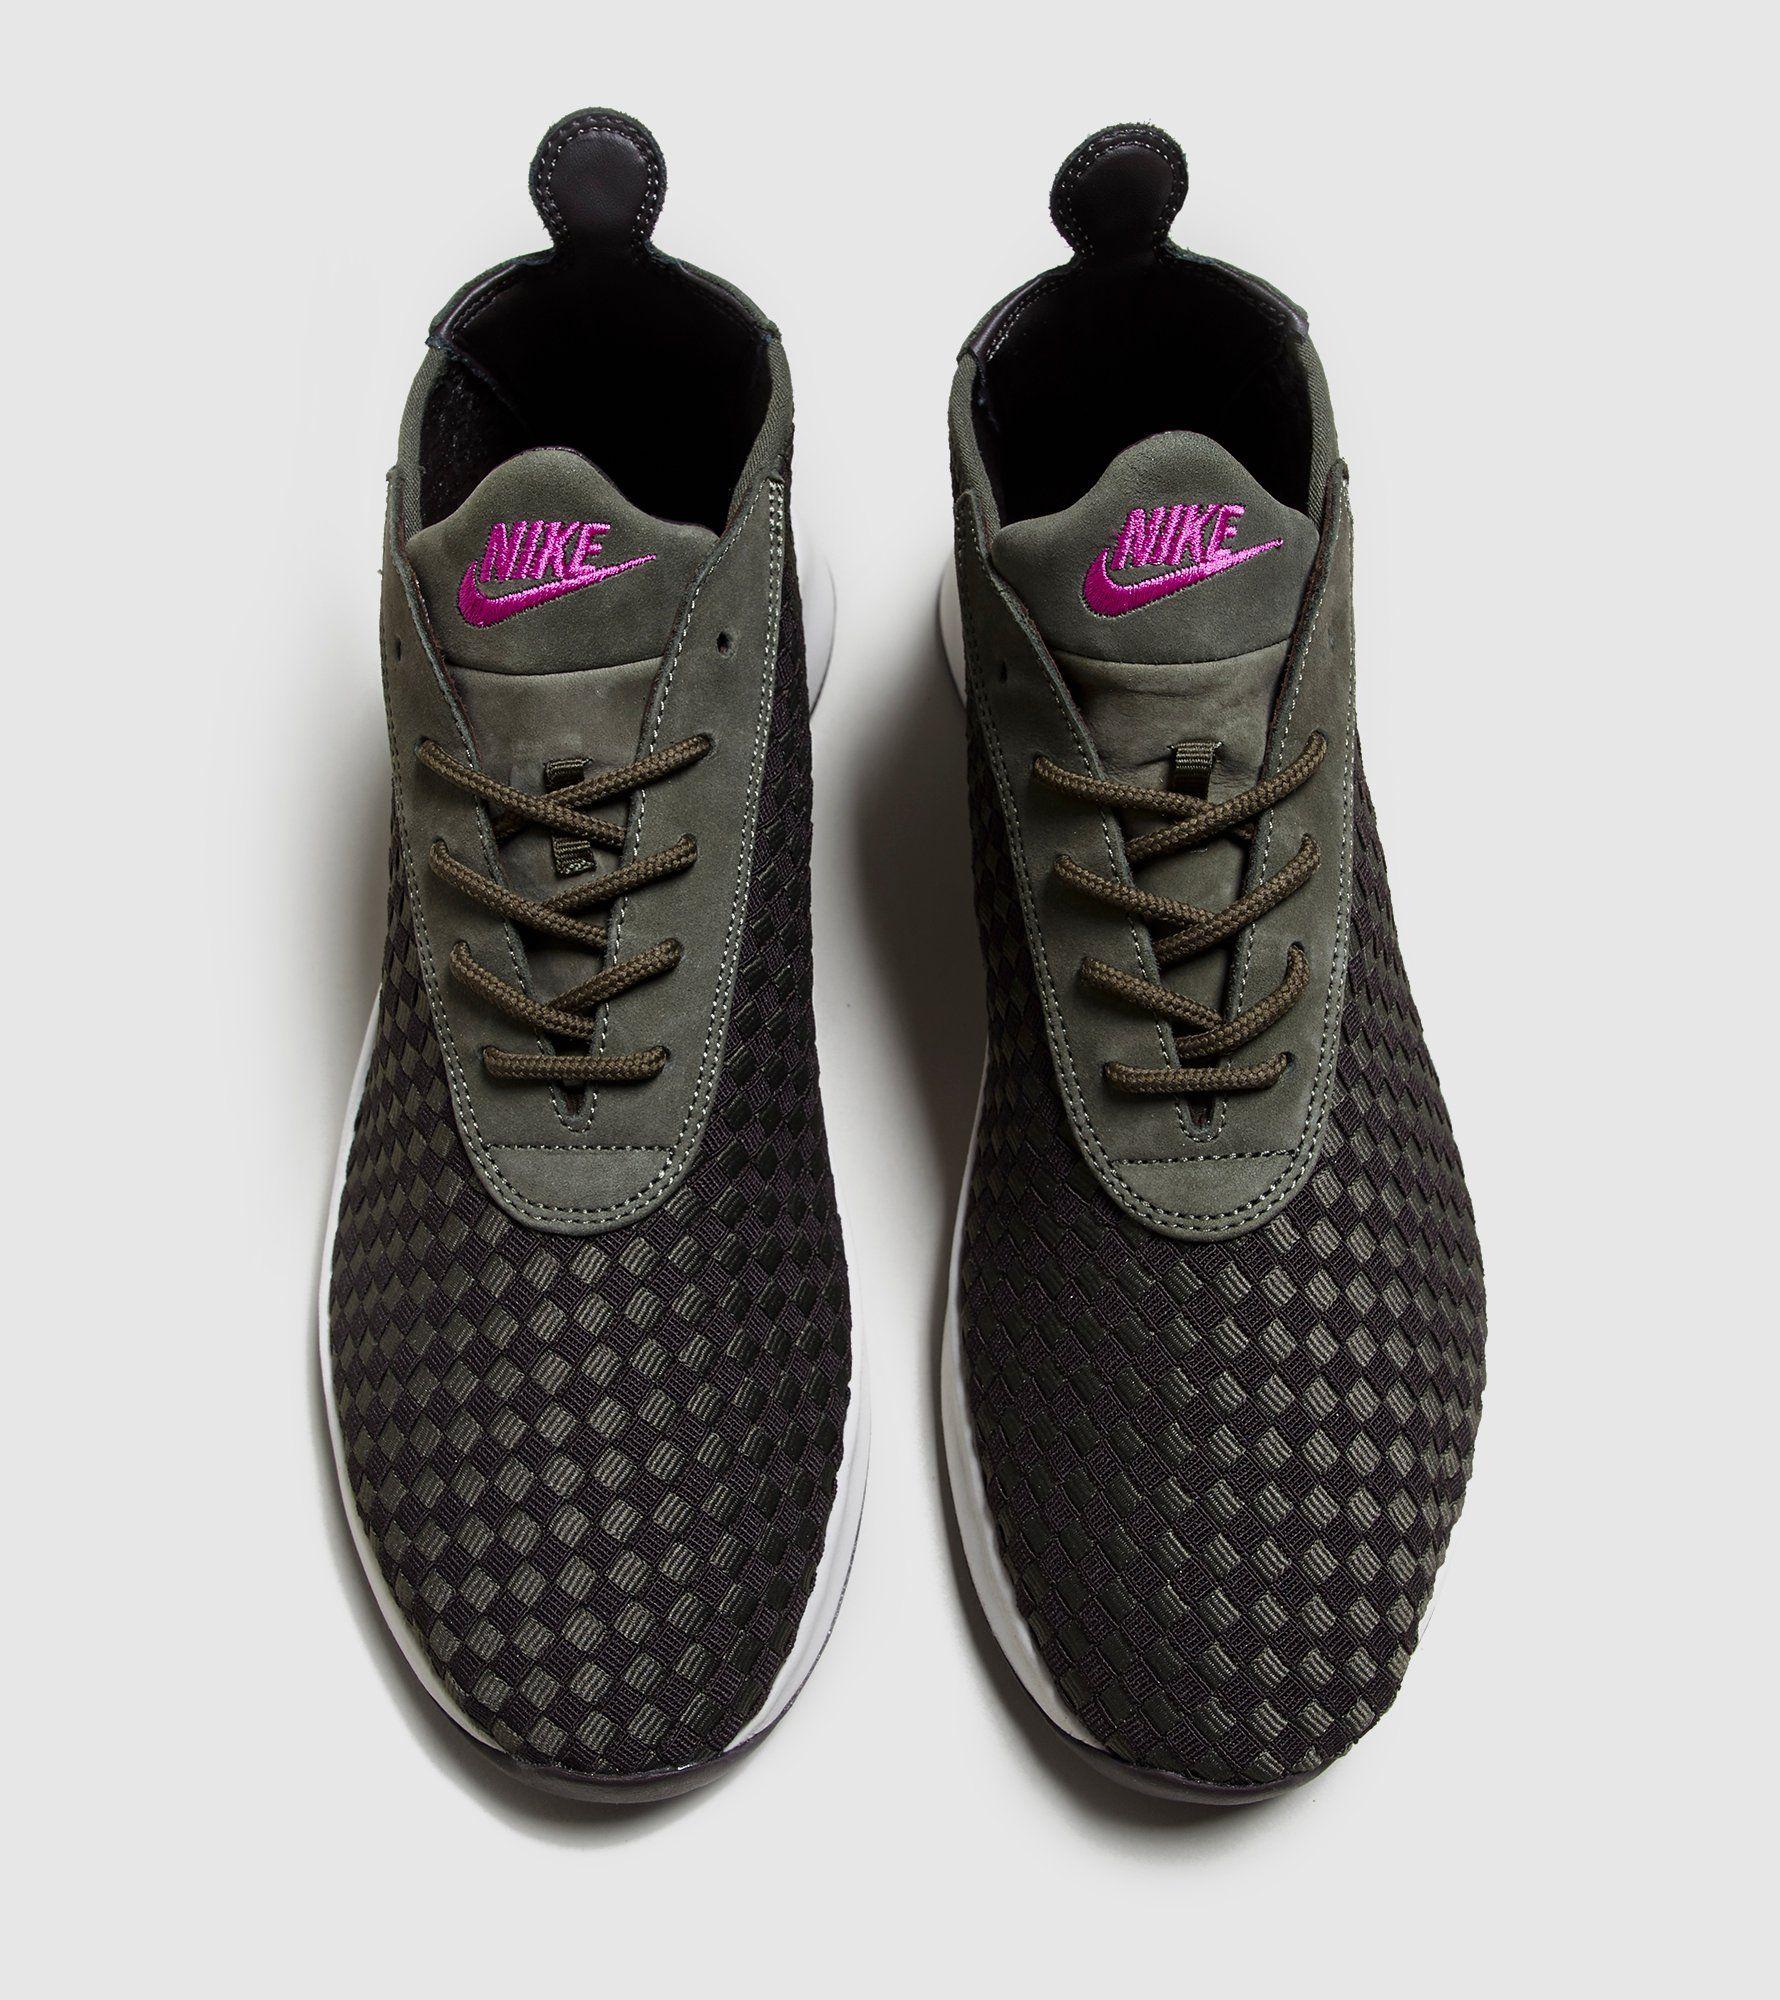 Nike Air Woven Boot